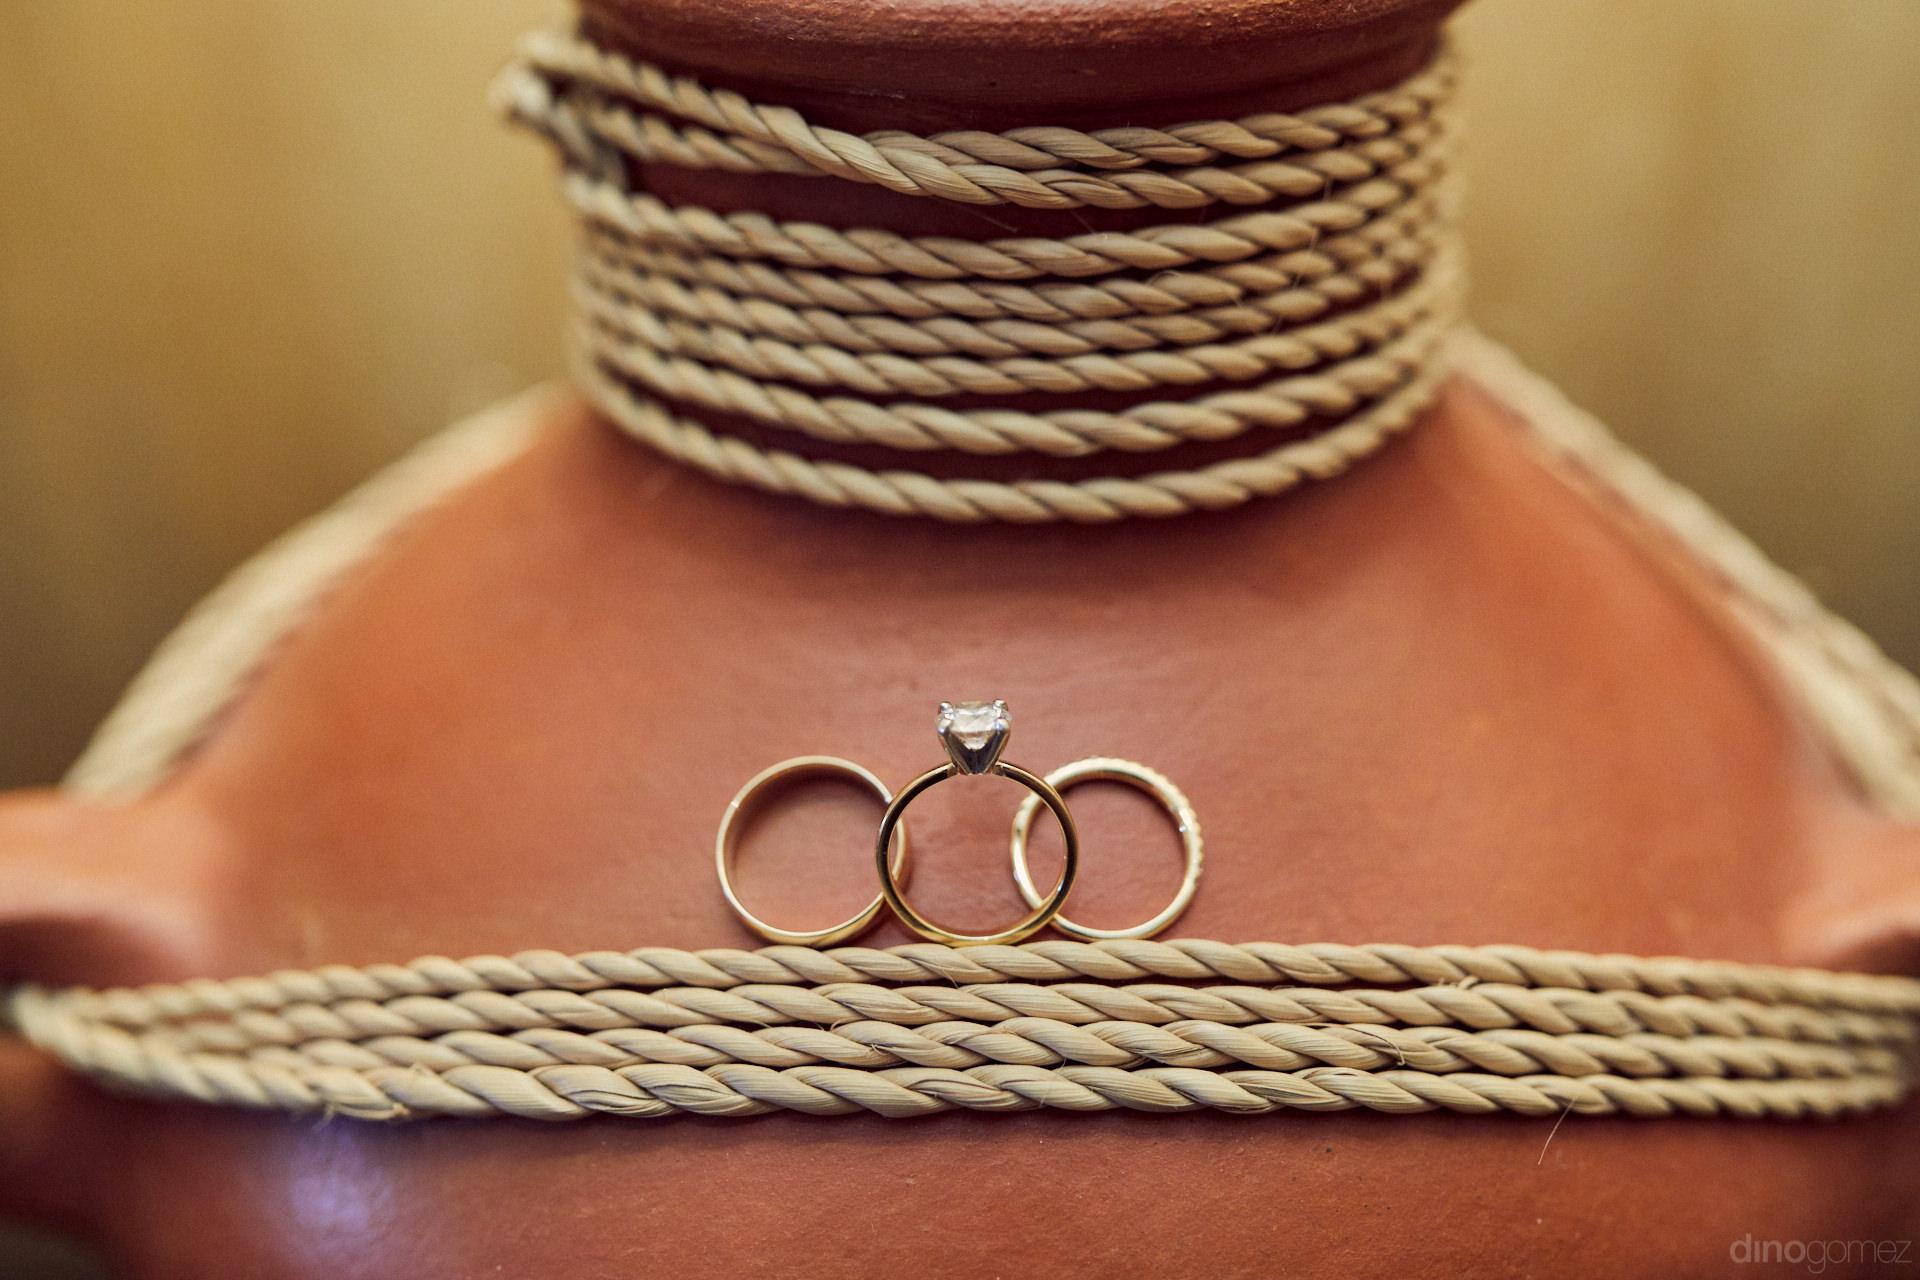 Wedding Rings For Destination Weddings In Los Cabos Mexico - Hilary & Bryan Flora Wedding